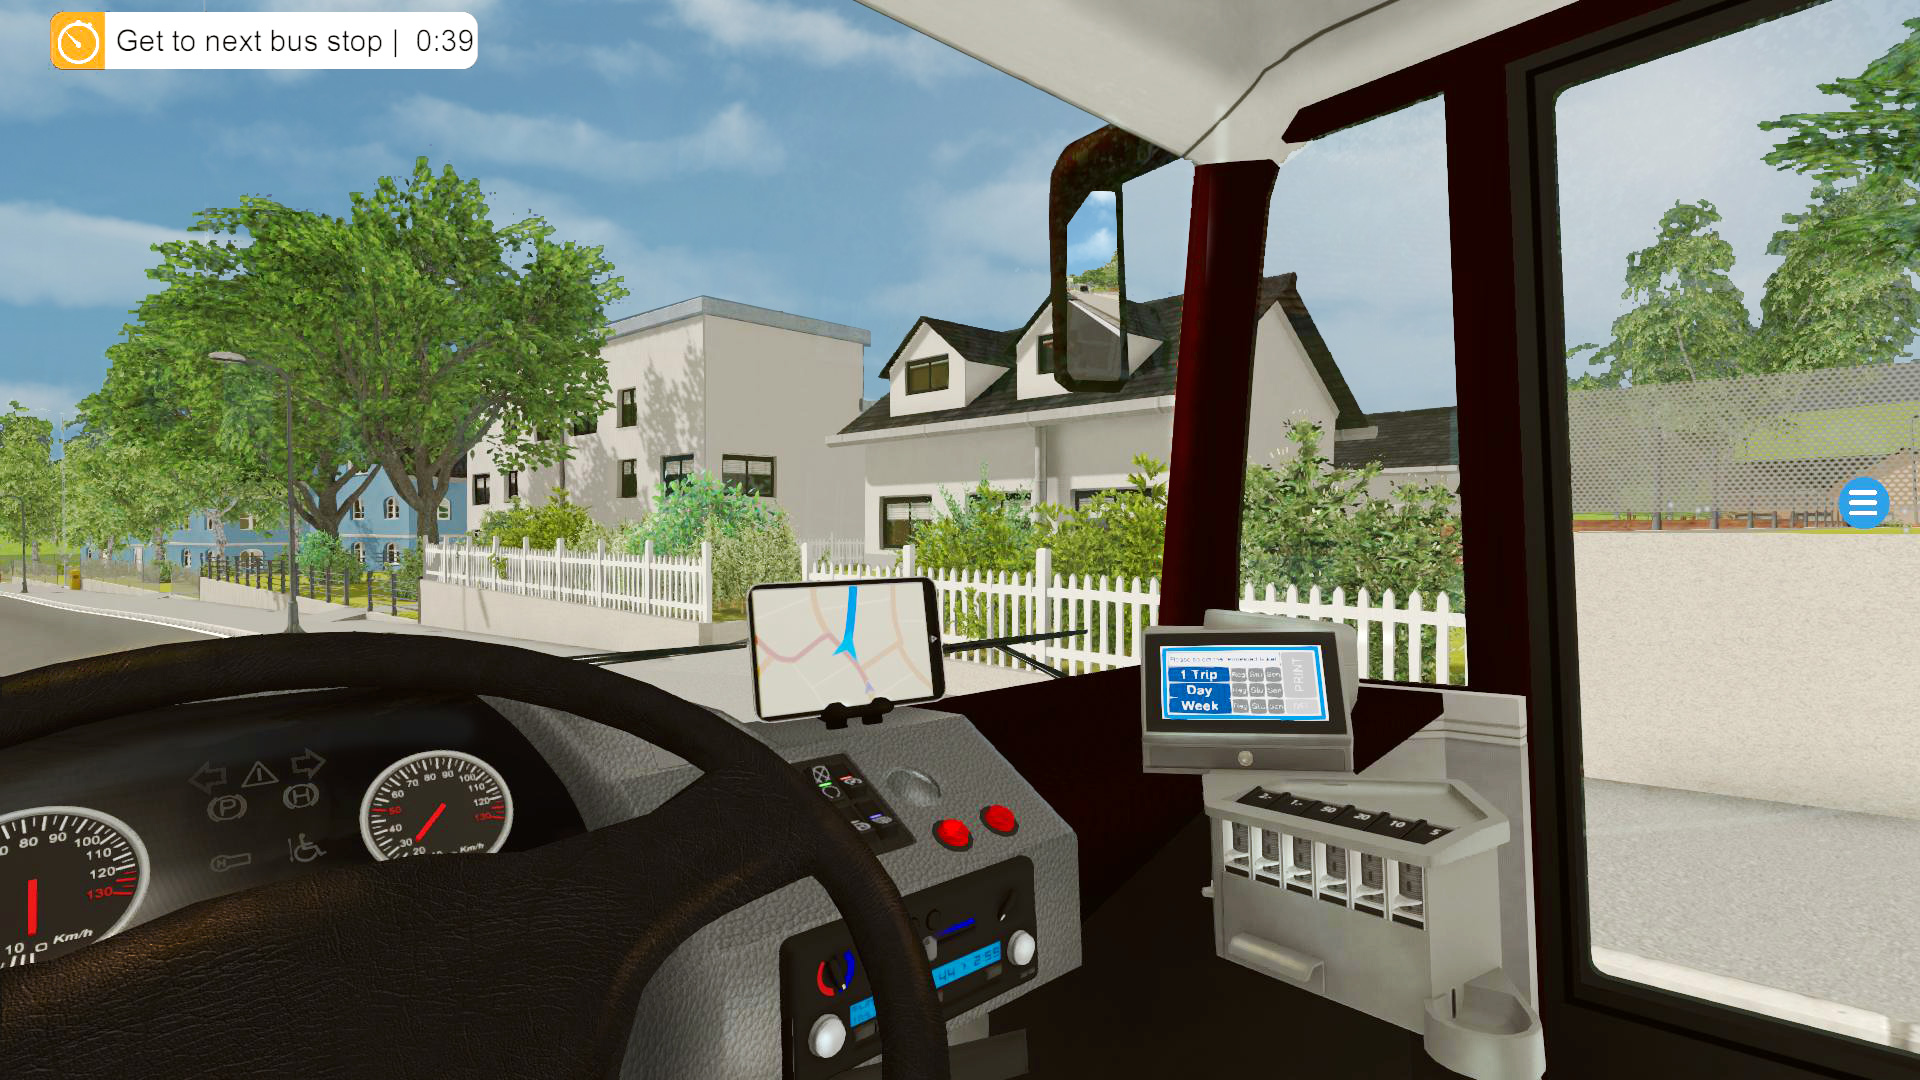 Bus Fahr Spiele